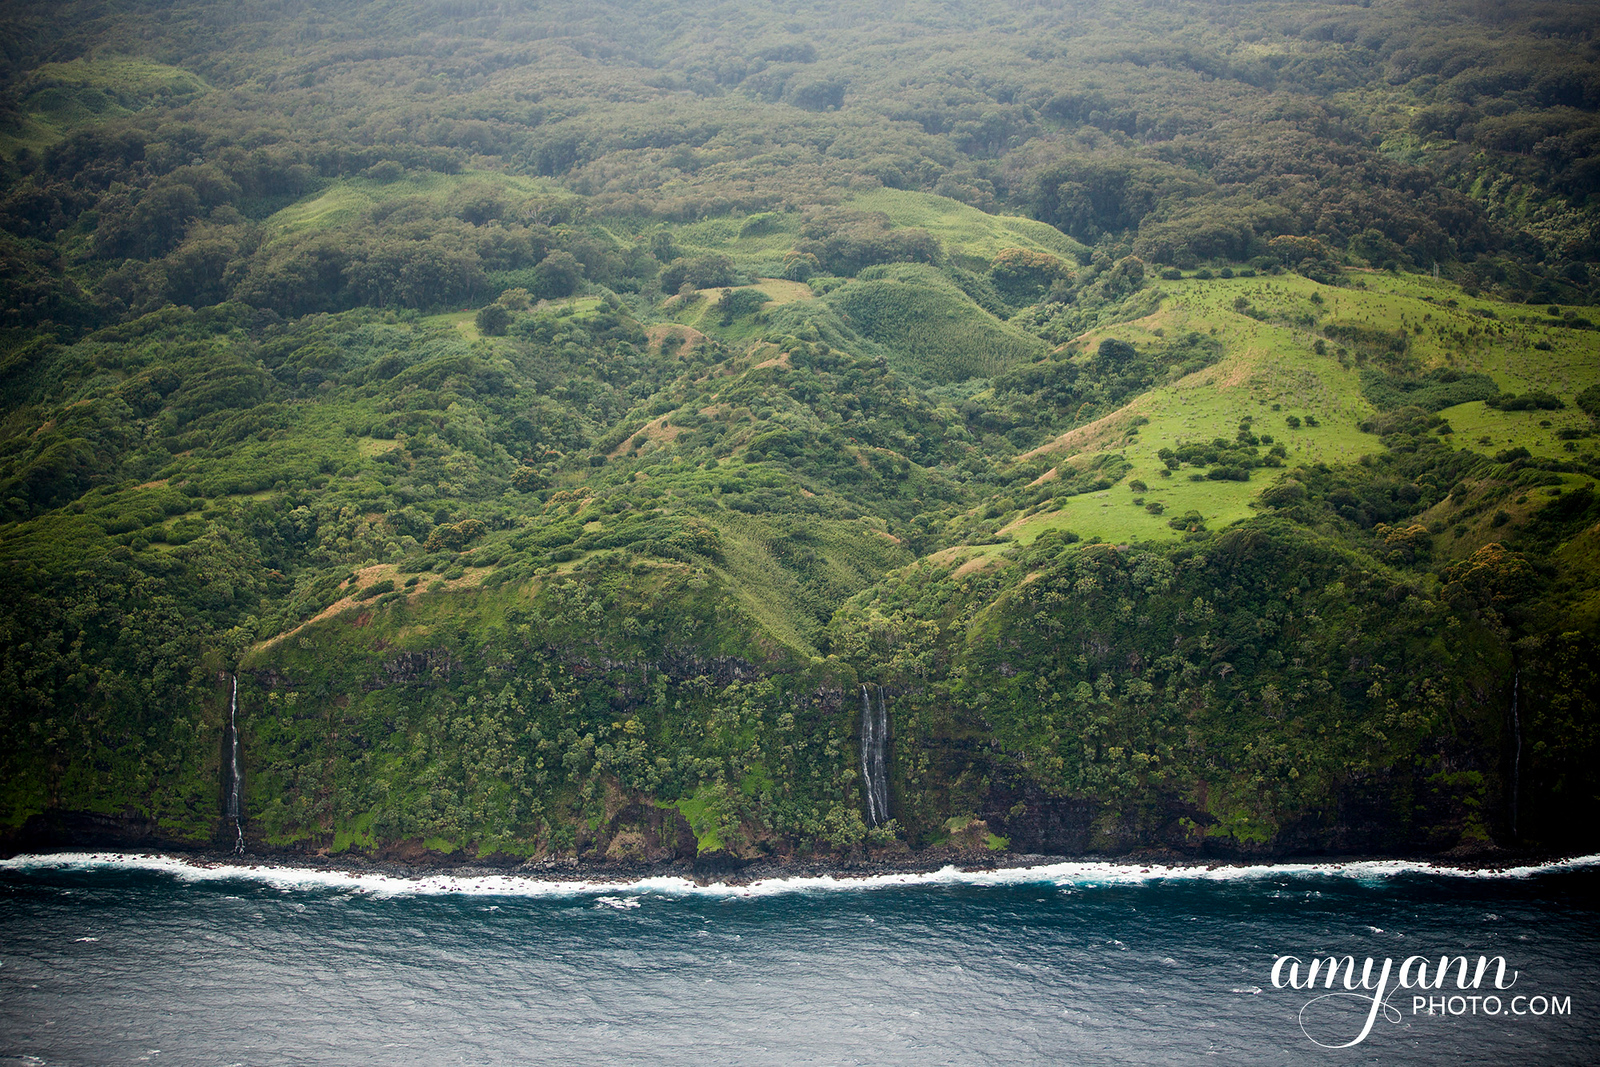 hawaii_amyannphoto_97